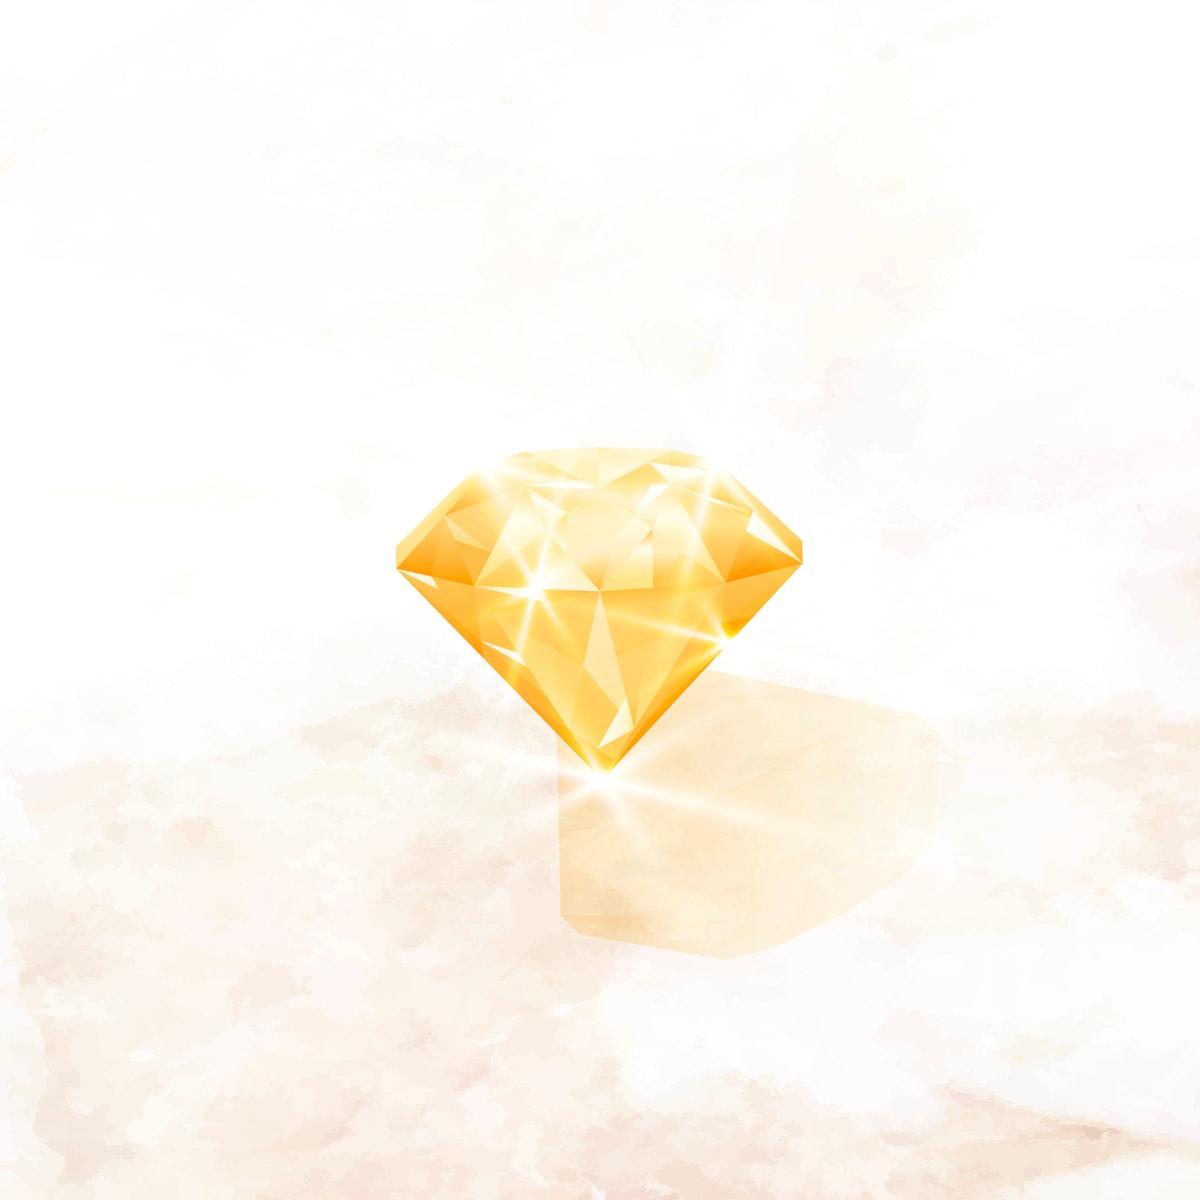 Yellow crystal gem design vector